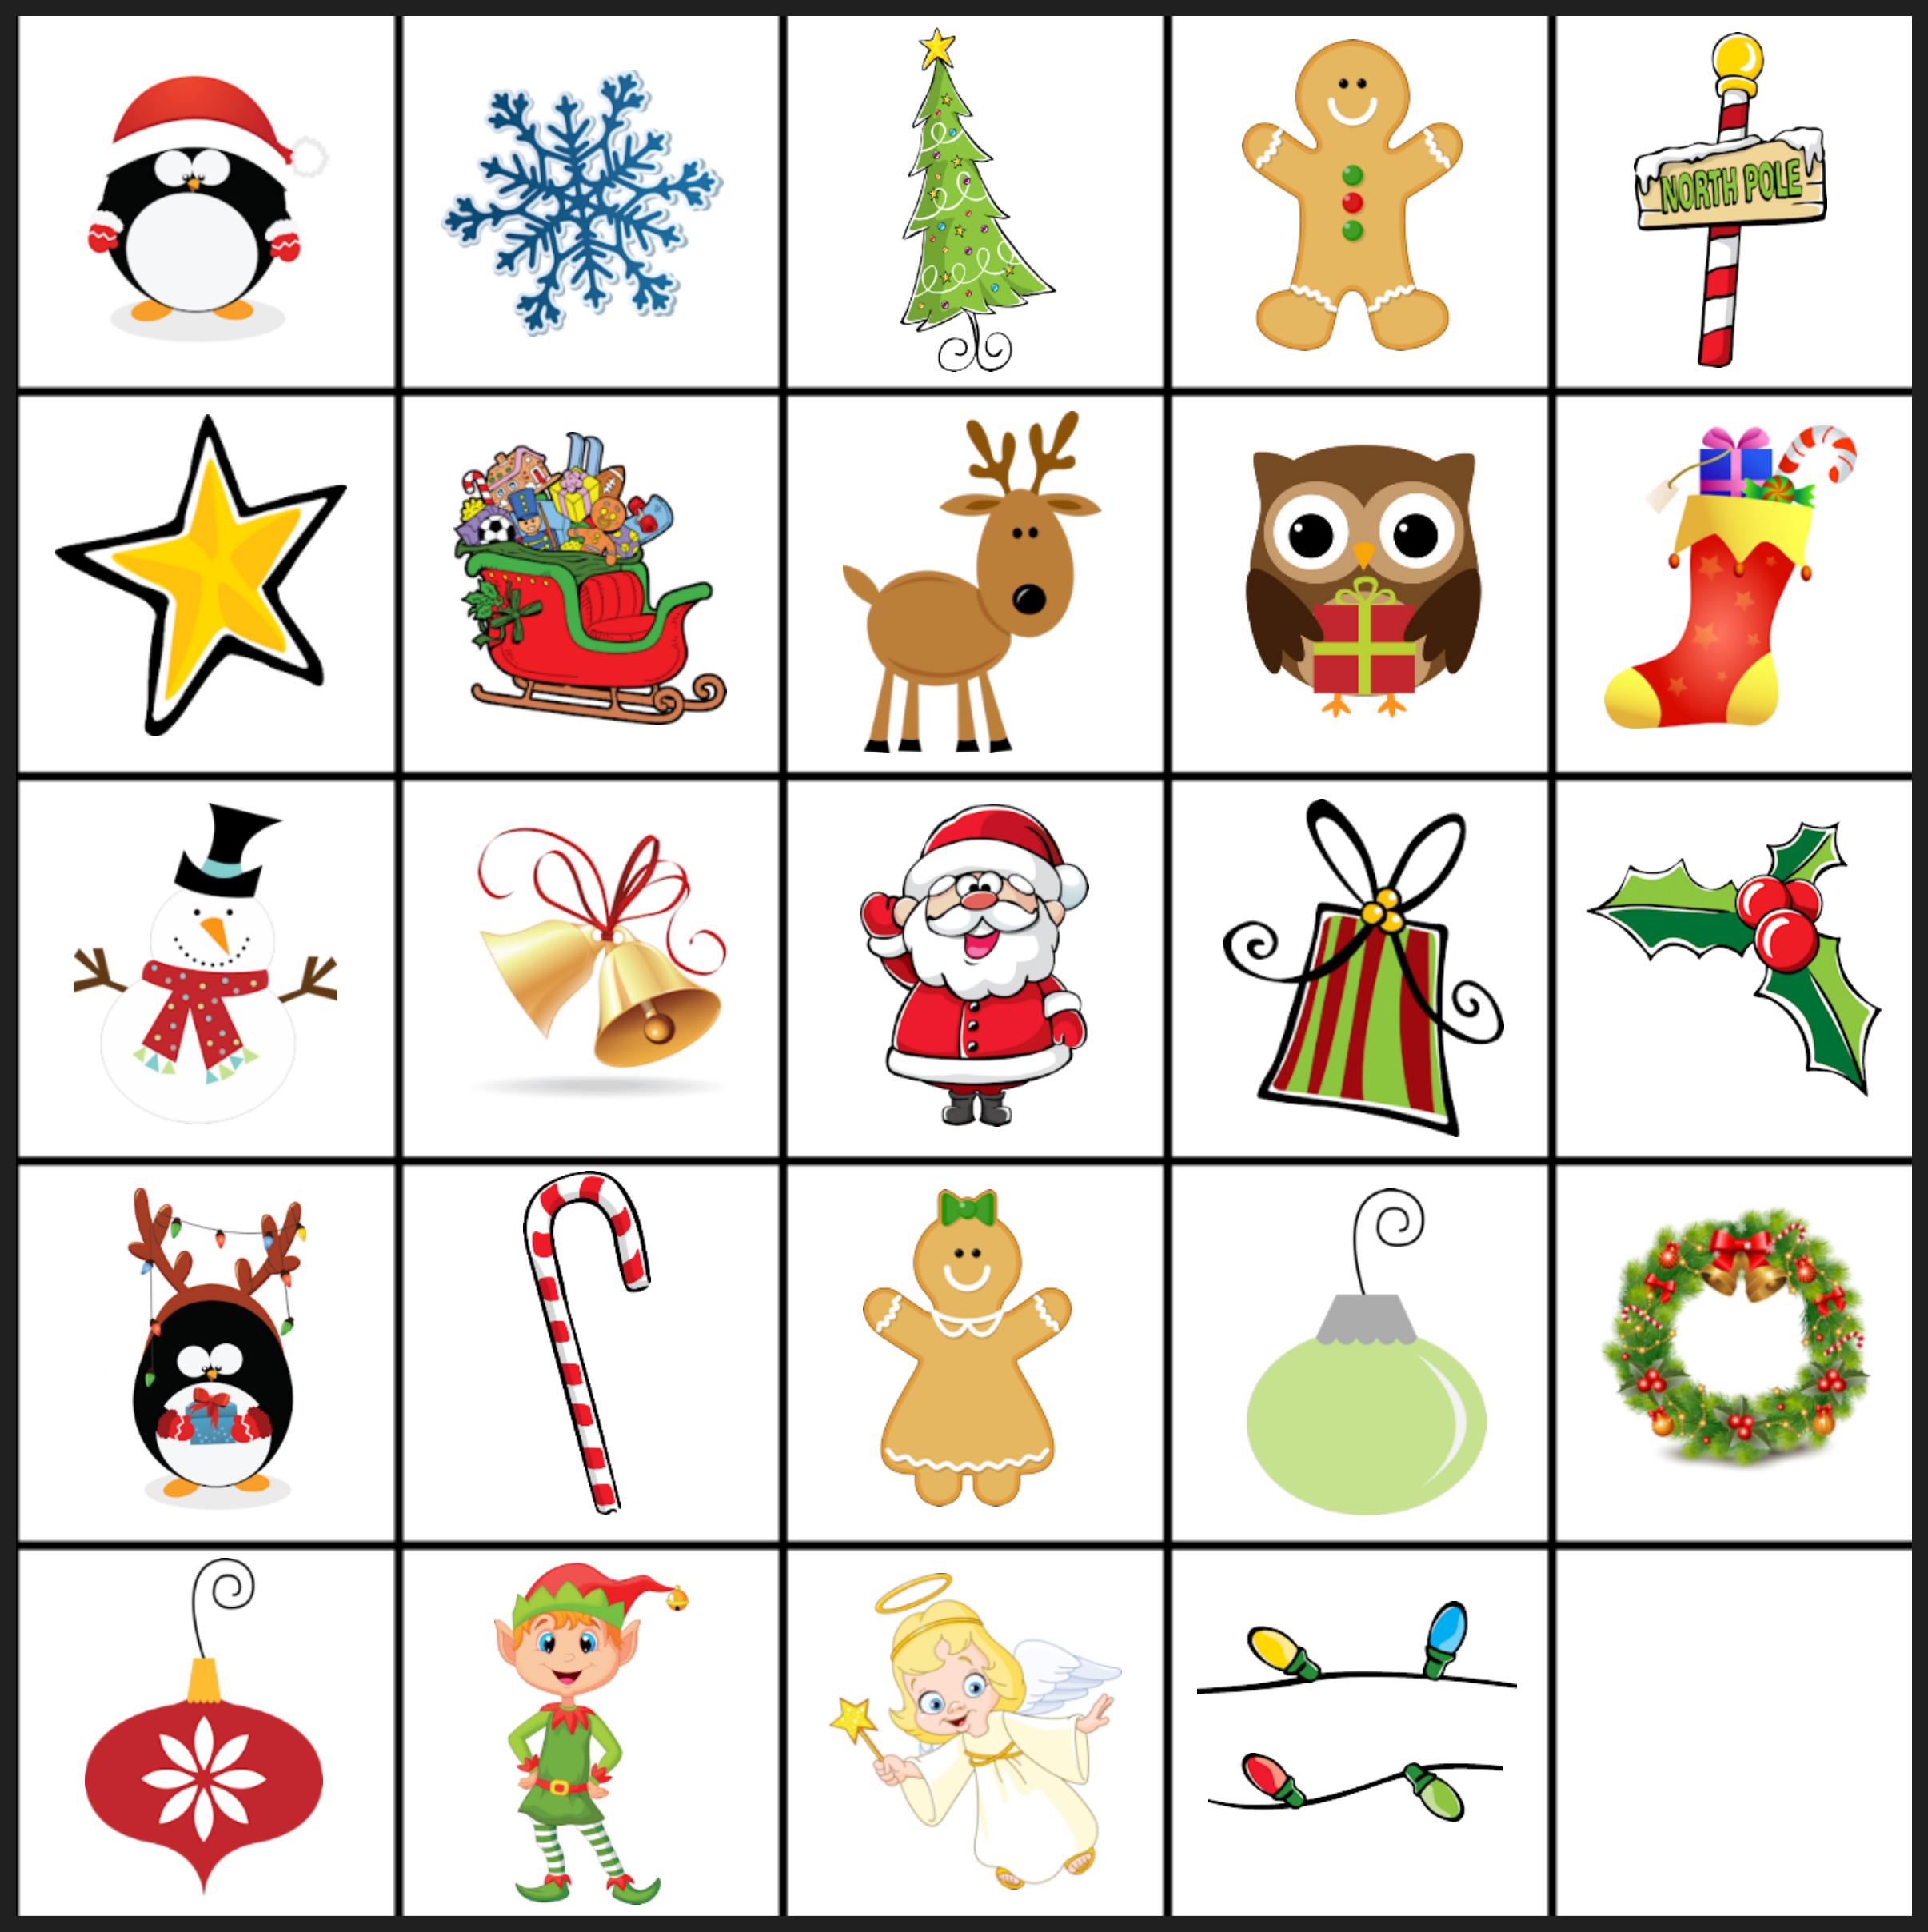 7 Images of Printable Christmas Matching Game